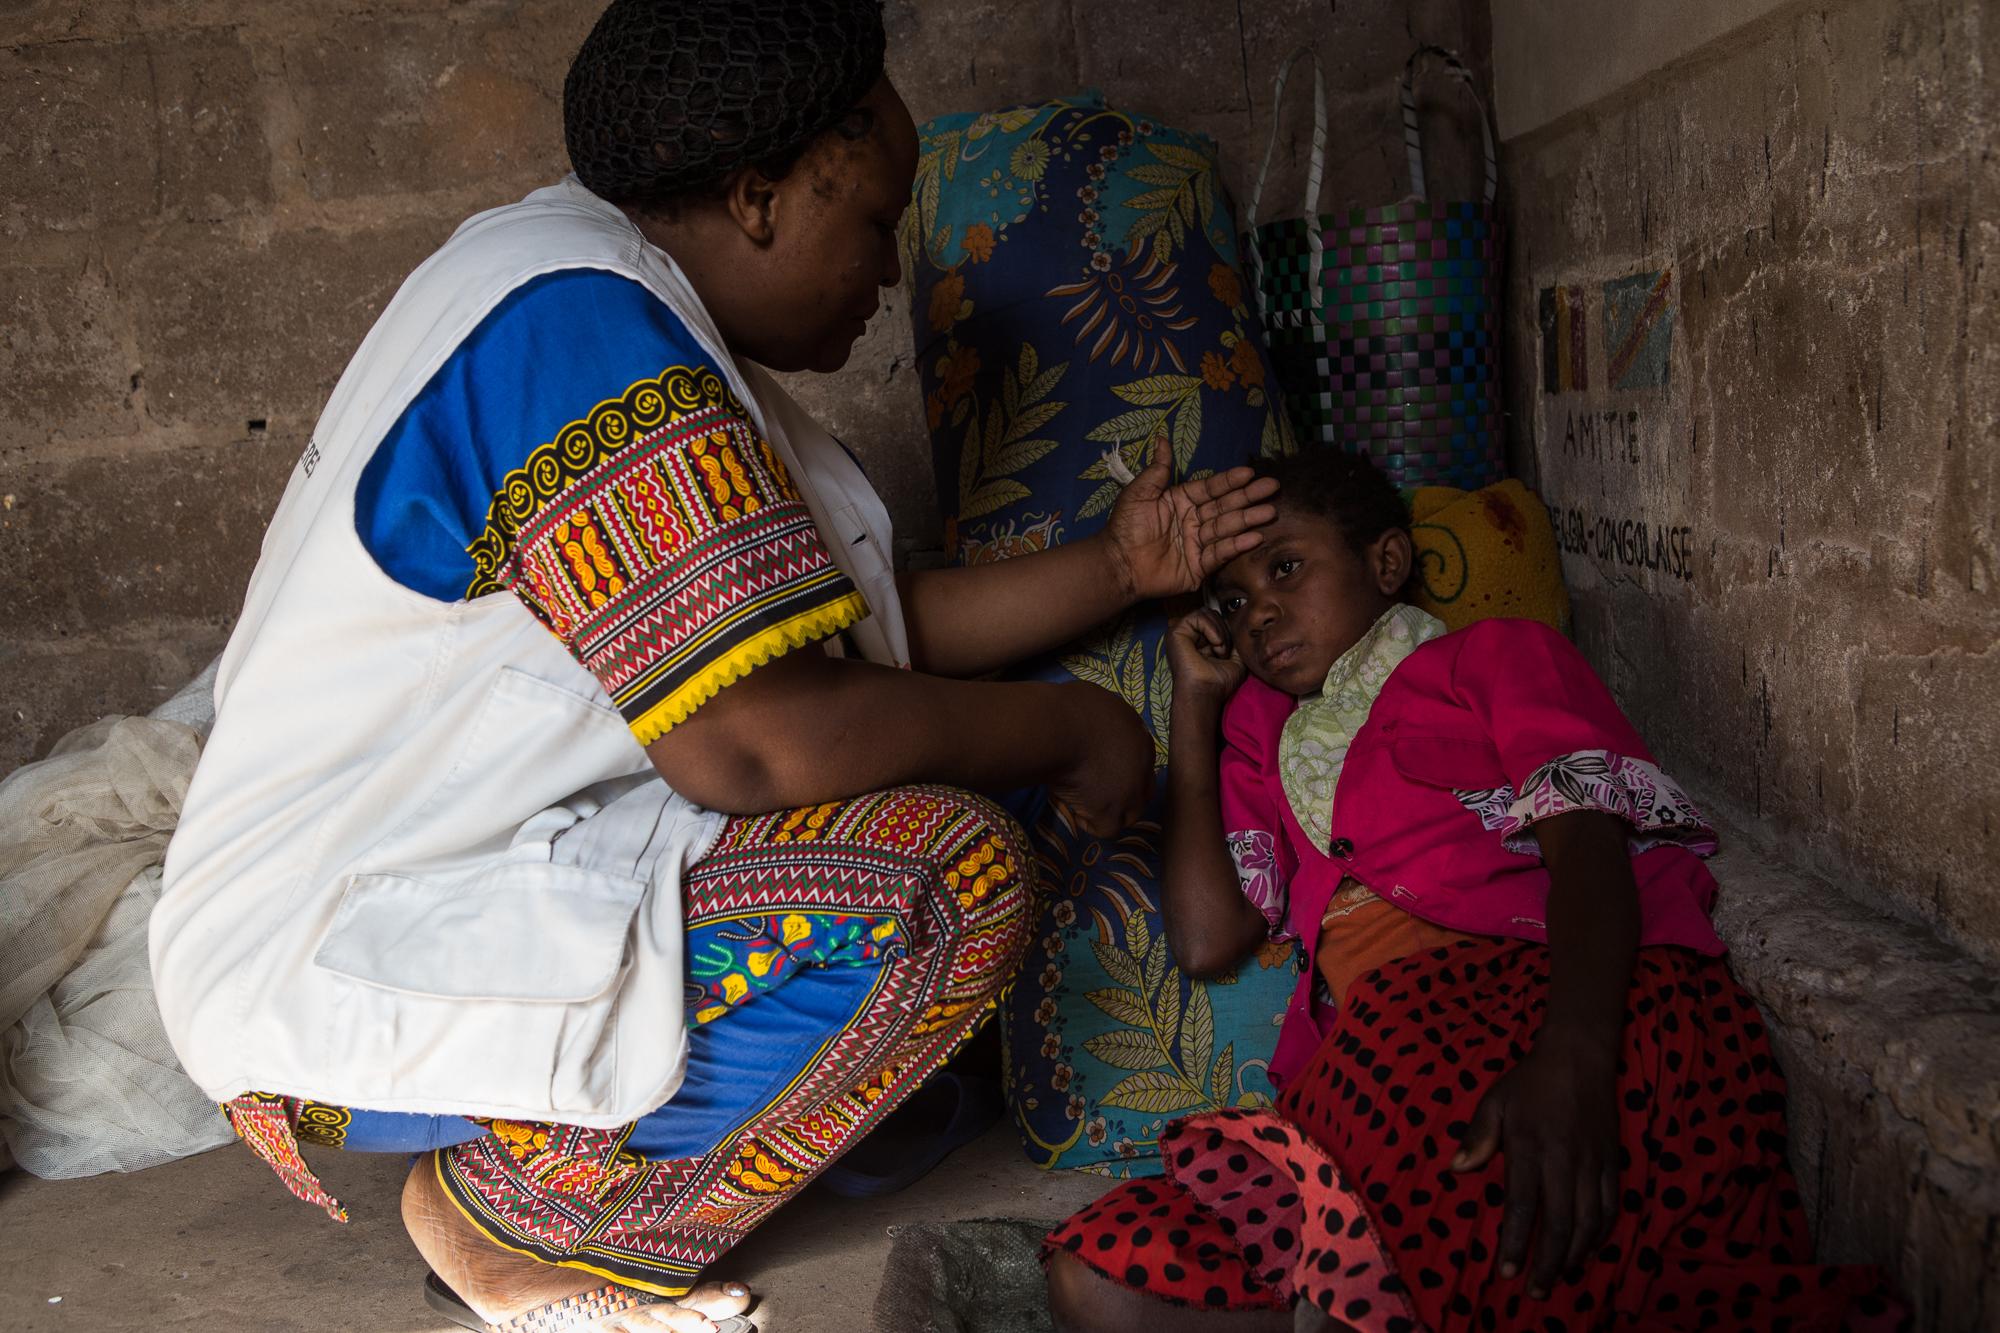 DRC Democratic Republic of Congo internally displaced people malnutrition